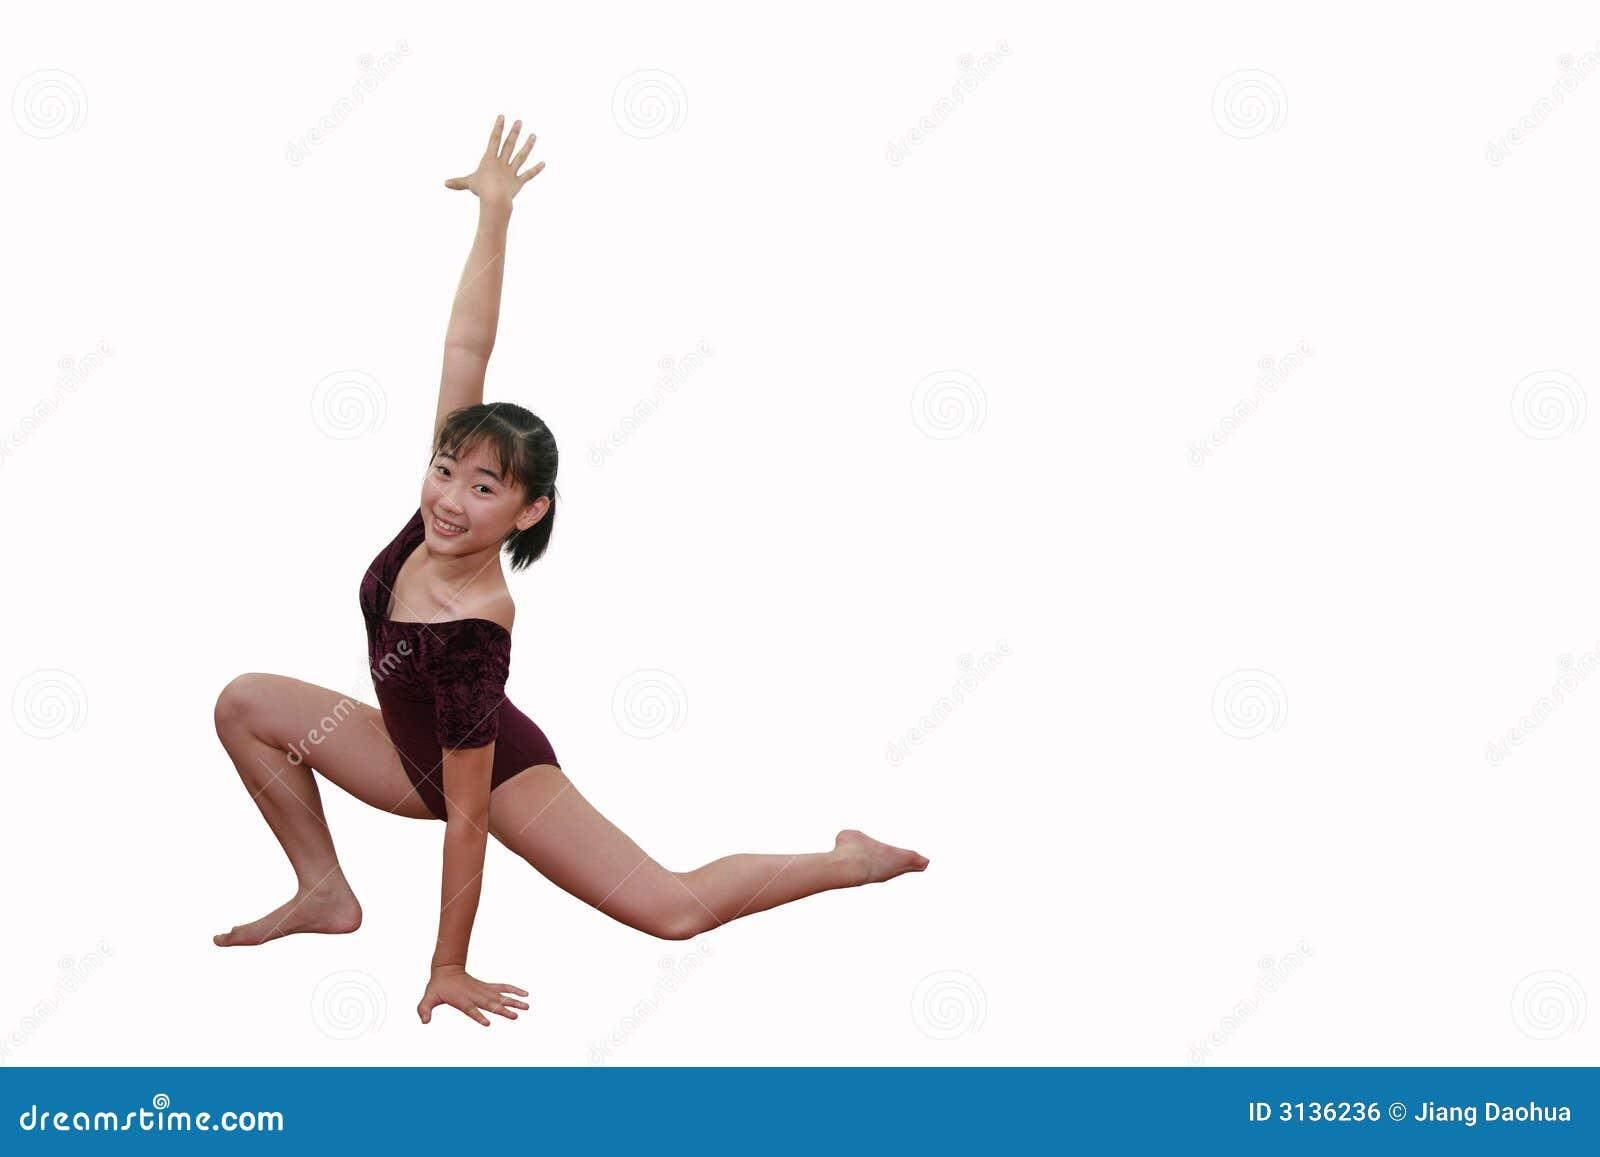 Gymnastics business plan